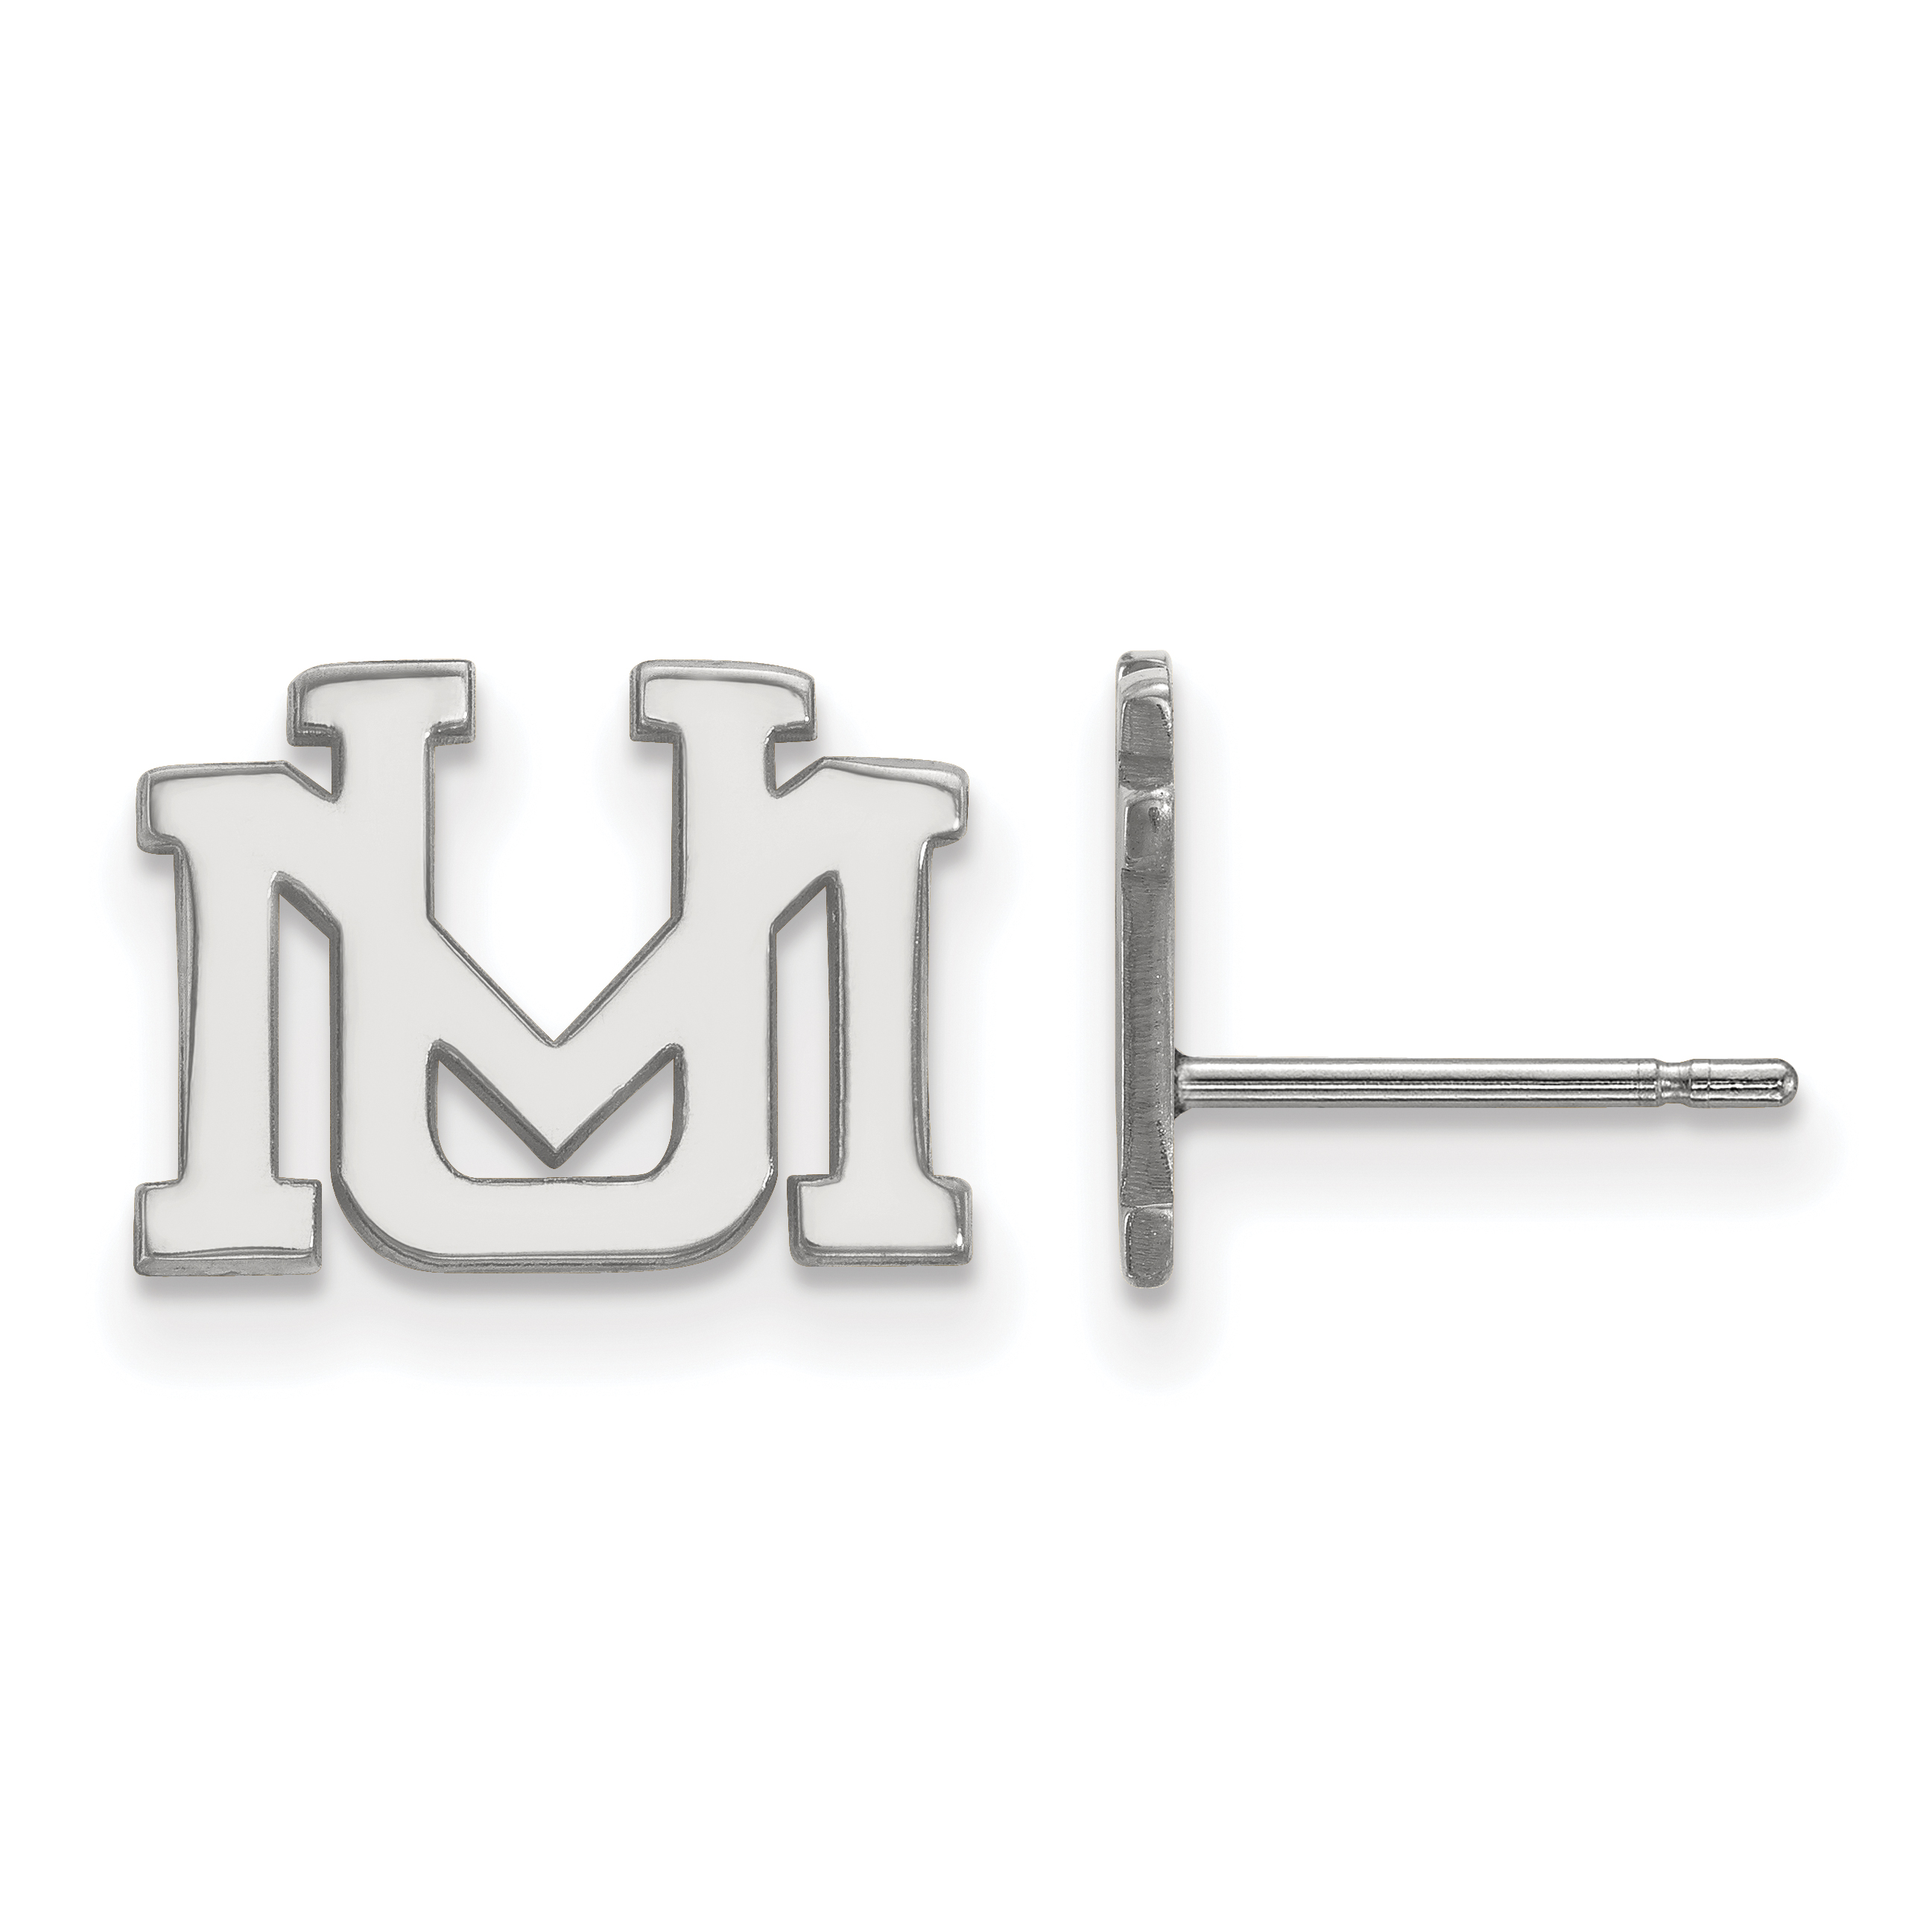 10kw University of Montana XS Post Earrings. weight: 1.49, Lengh: 9mm